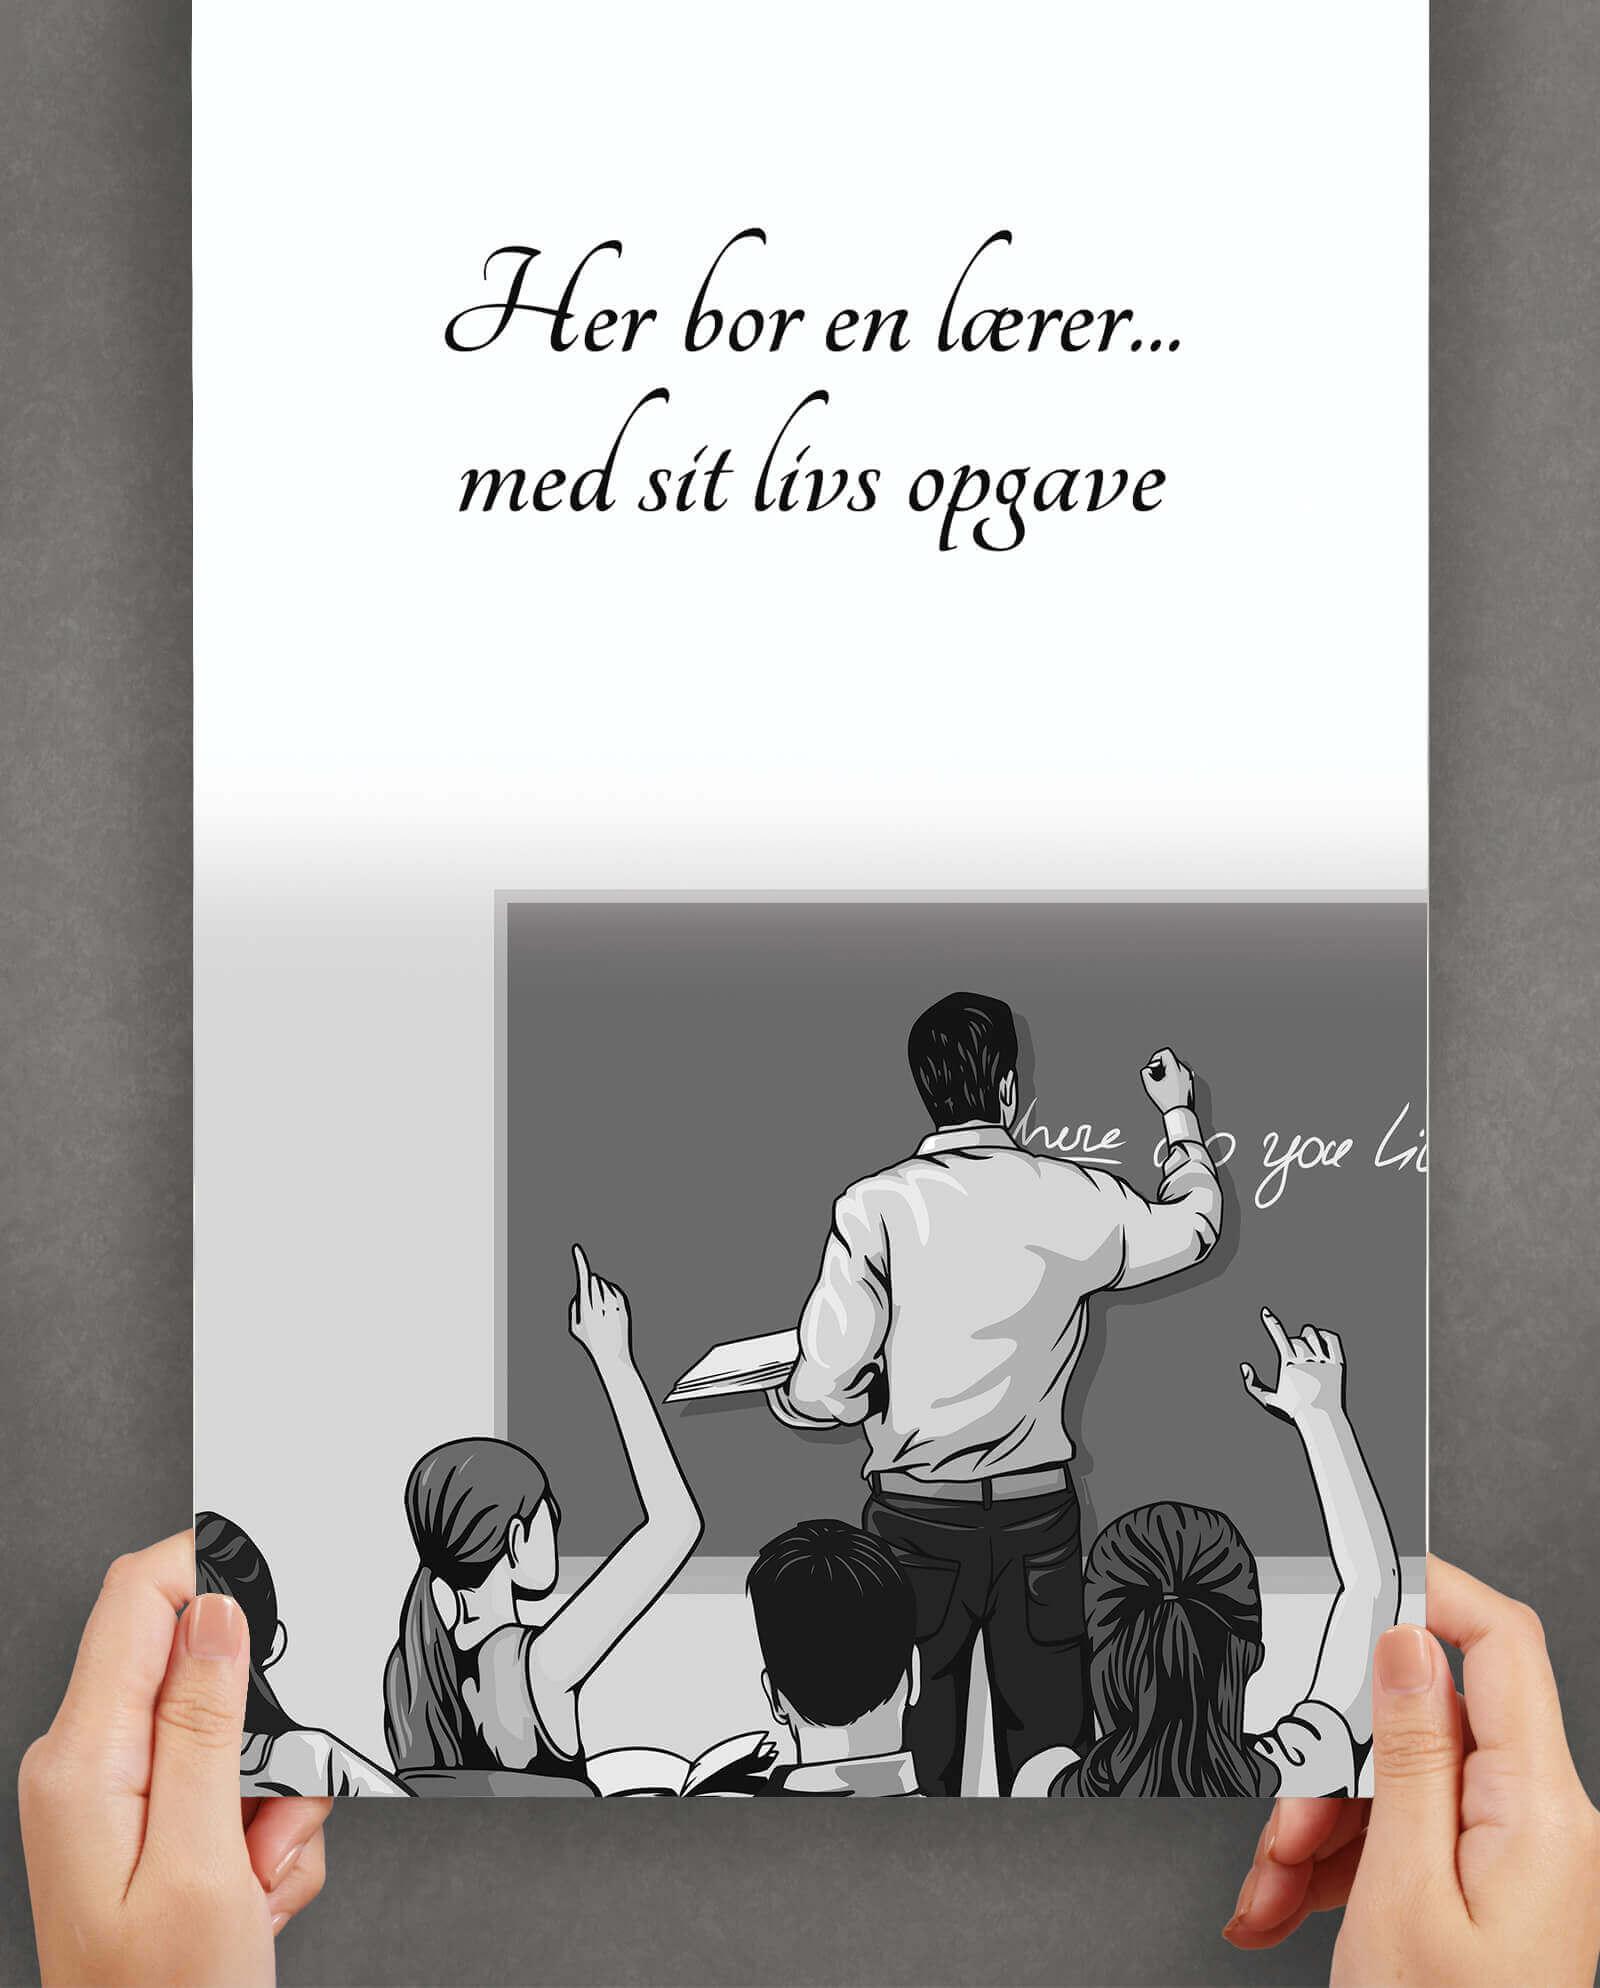 laerer-job-plakat